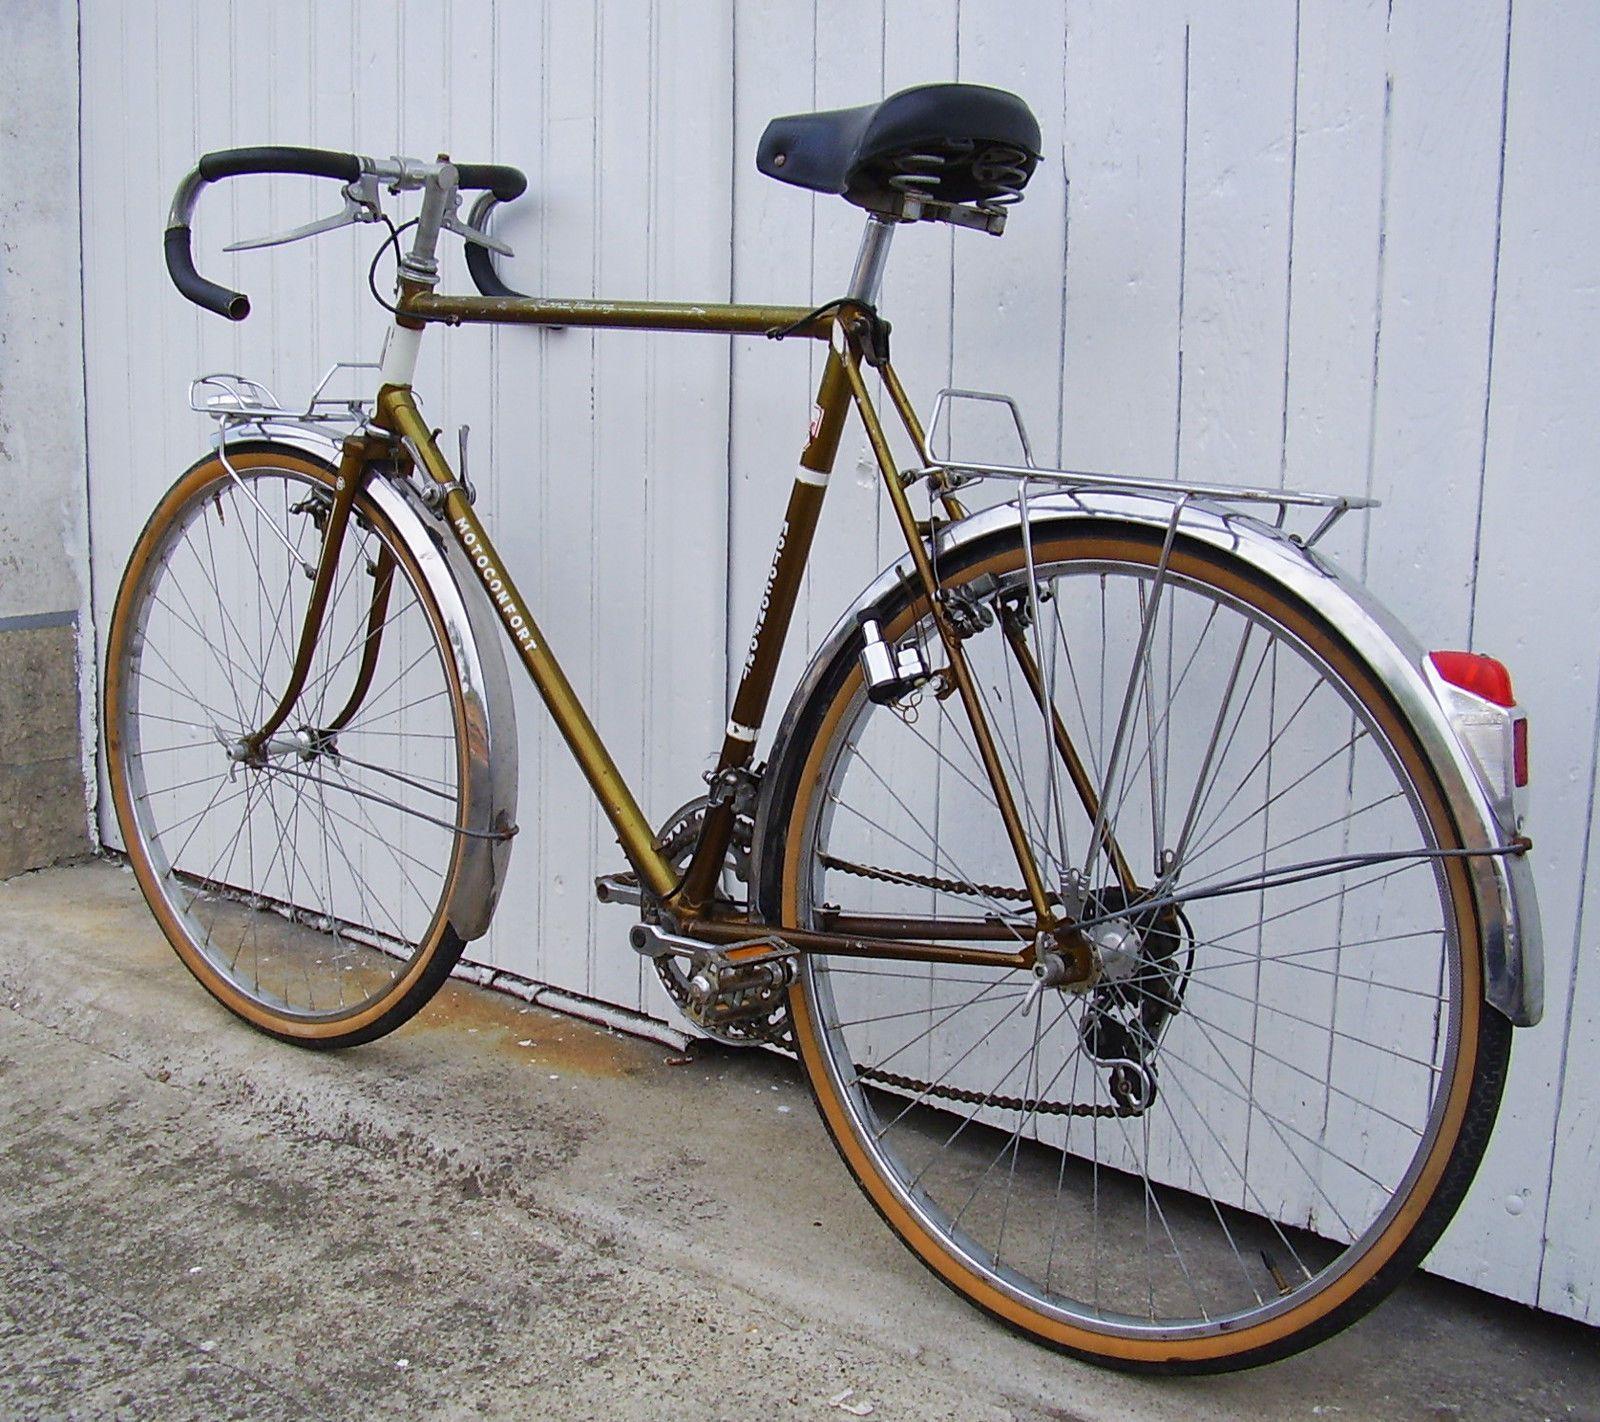 v lo randonneuse motoconfort 650b demi course cyclotouriste randonneur bicycling. Black Bedroom Furniture Sets. Home Design Ideas